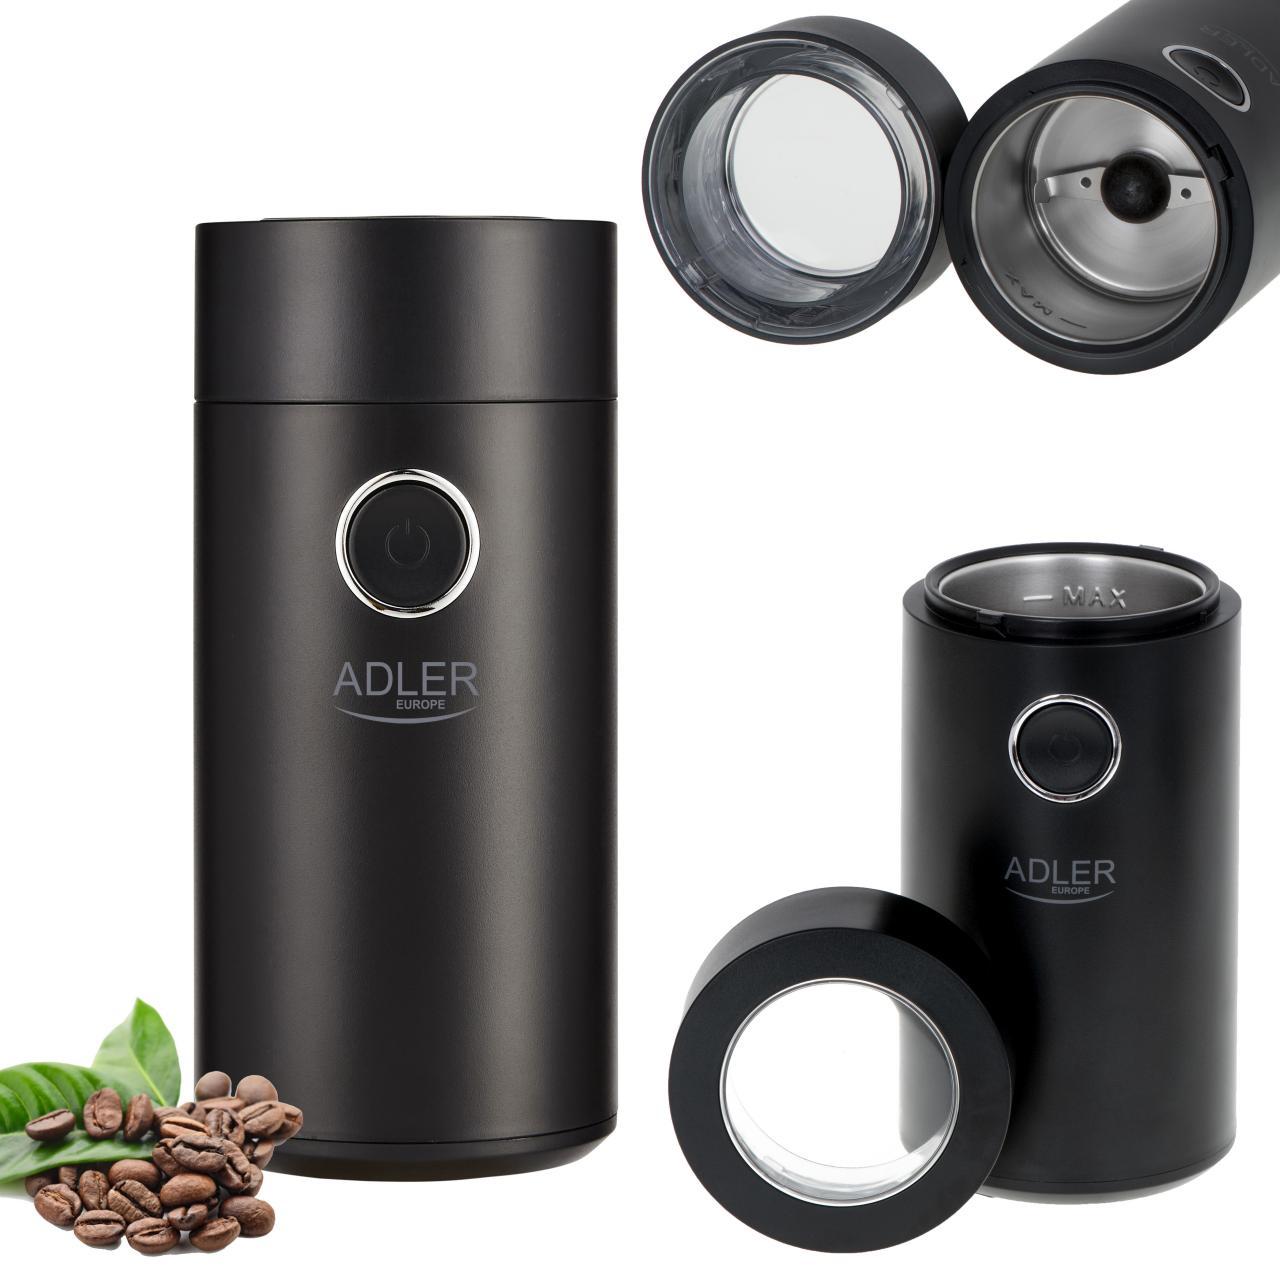 Rasnita de cafea Adler AD 4446bs, 75 g, putere 150 W, Negru/Argintiu